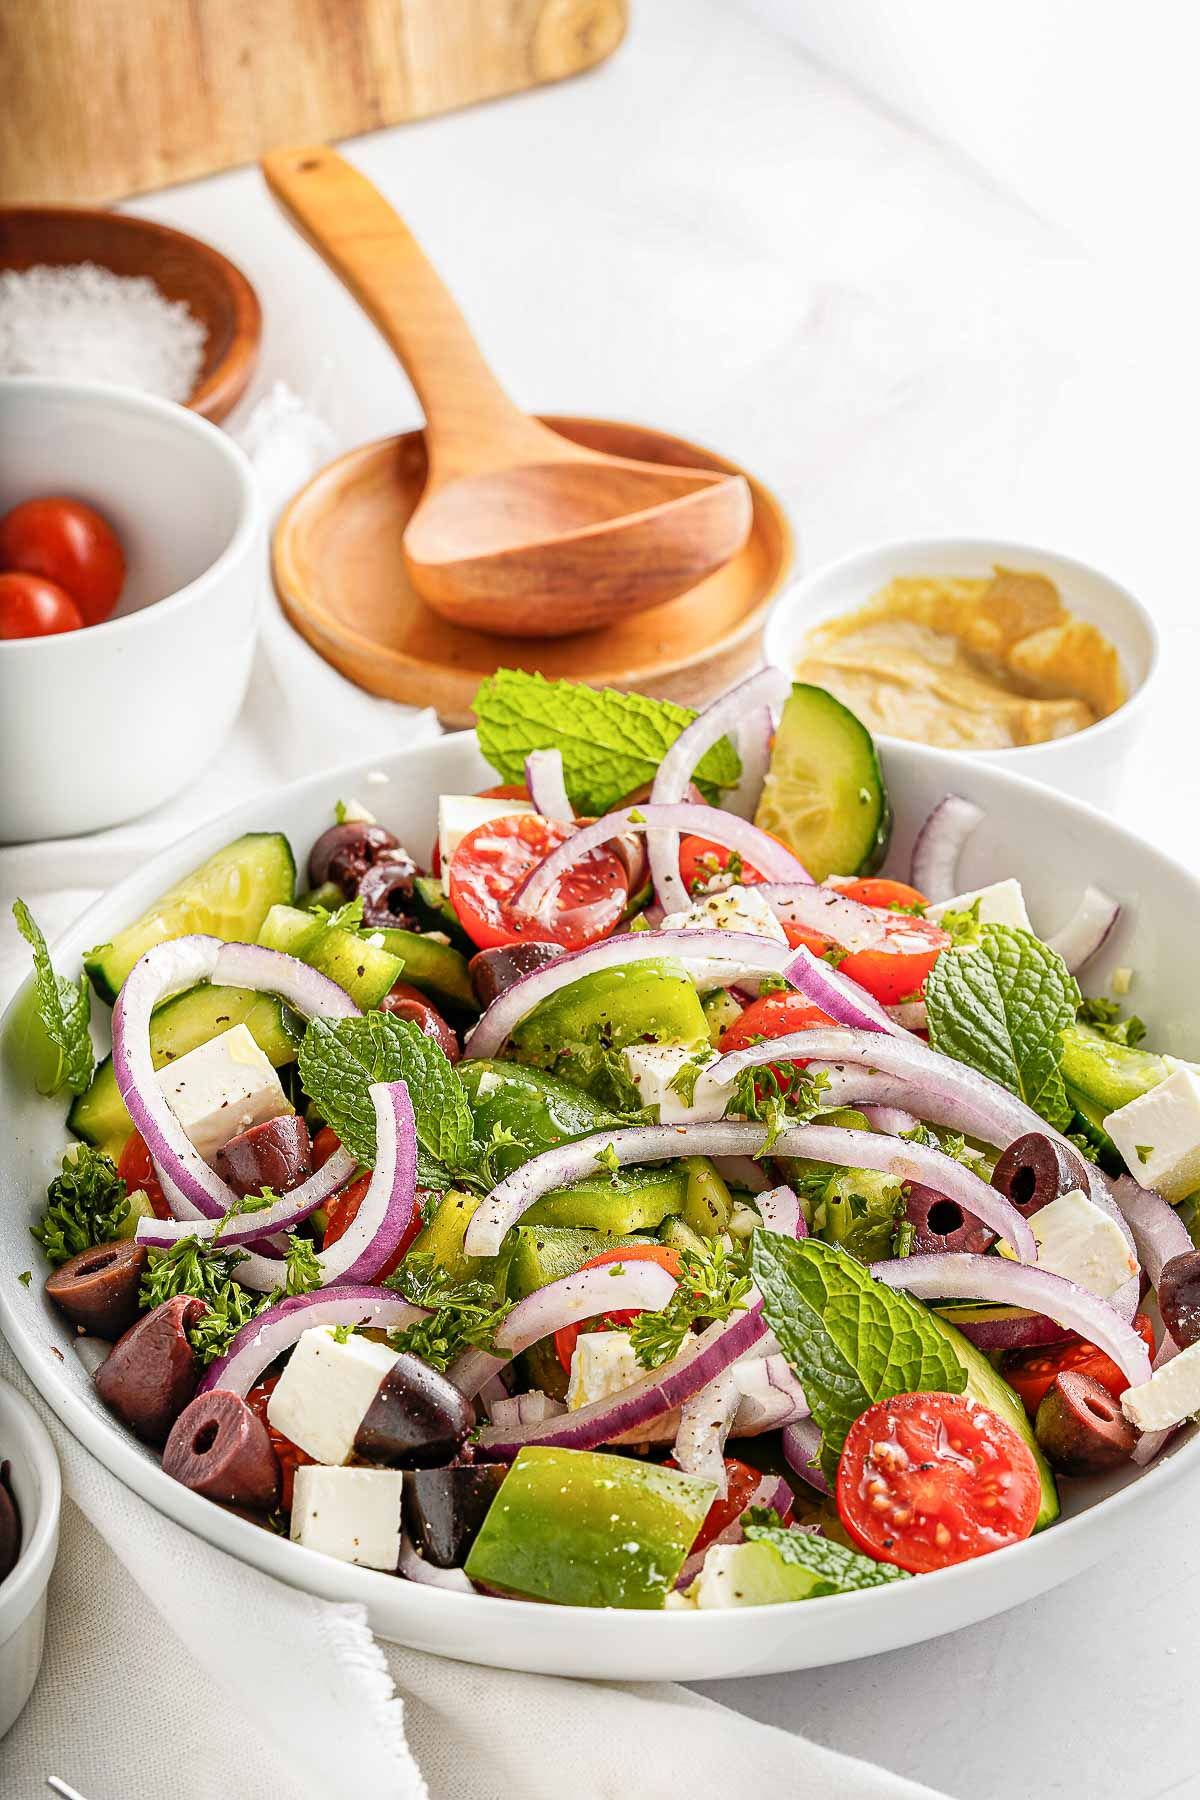 greek salad side view close